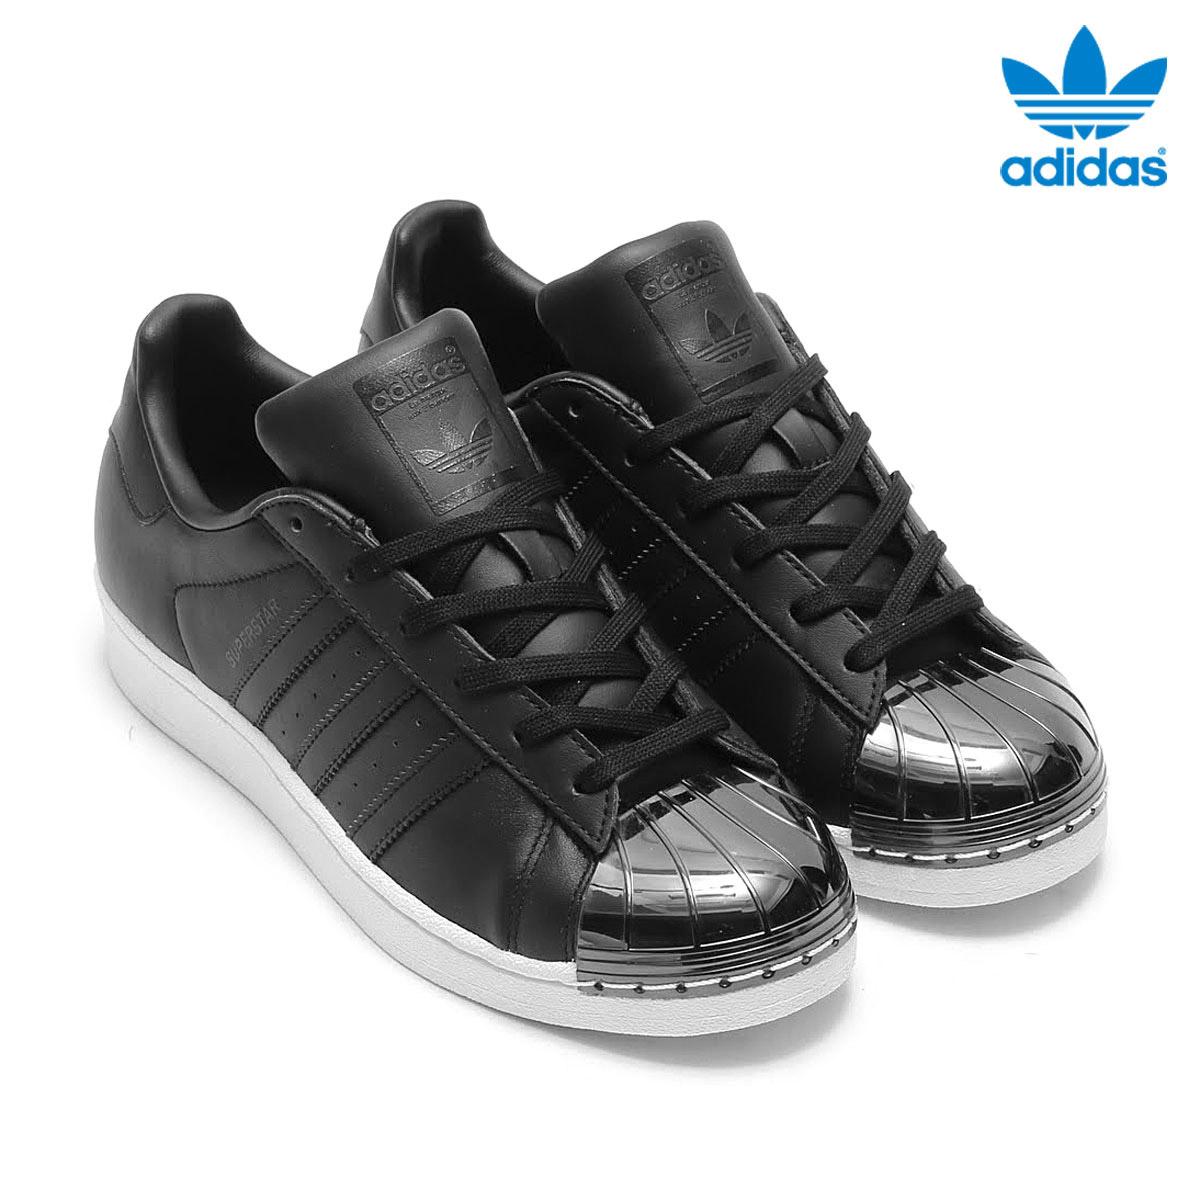 adidas Originals SUPERSTAR METAL TOE W (Adidas originals superstar metal toe) (Core Black/Core Black/Running White)